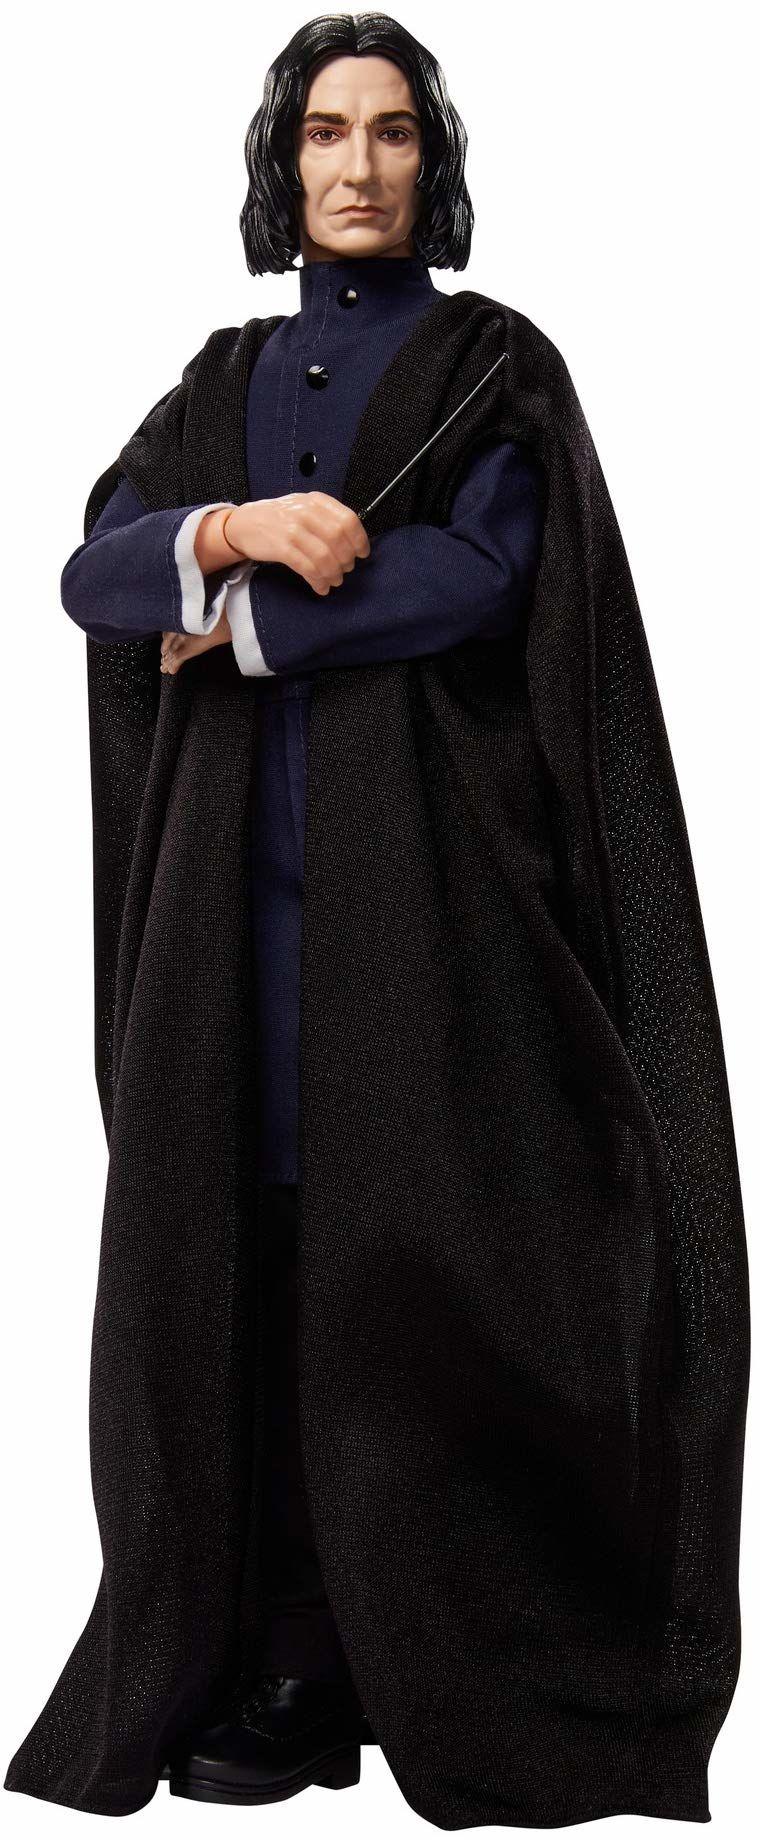 Harry Potter Severus Snape lalka